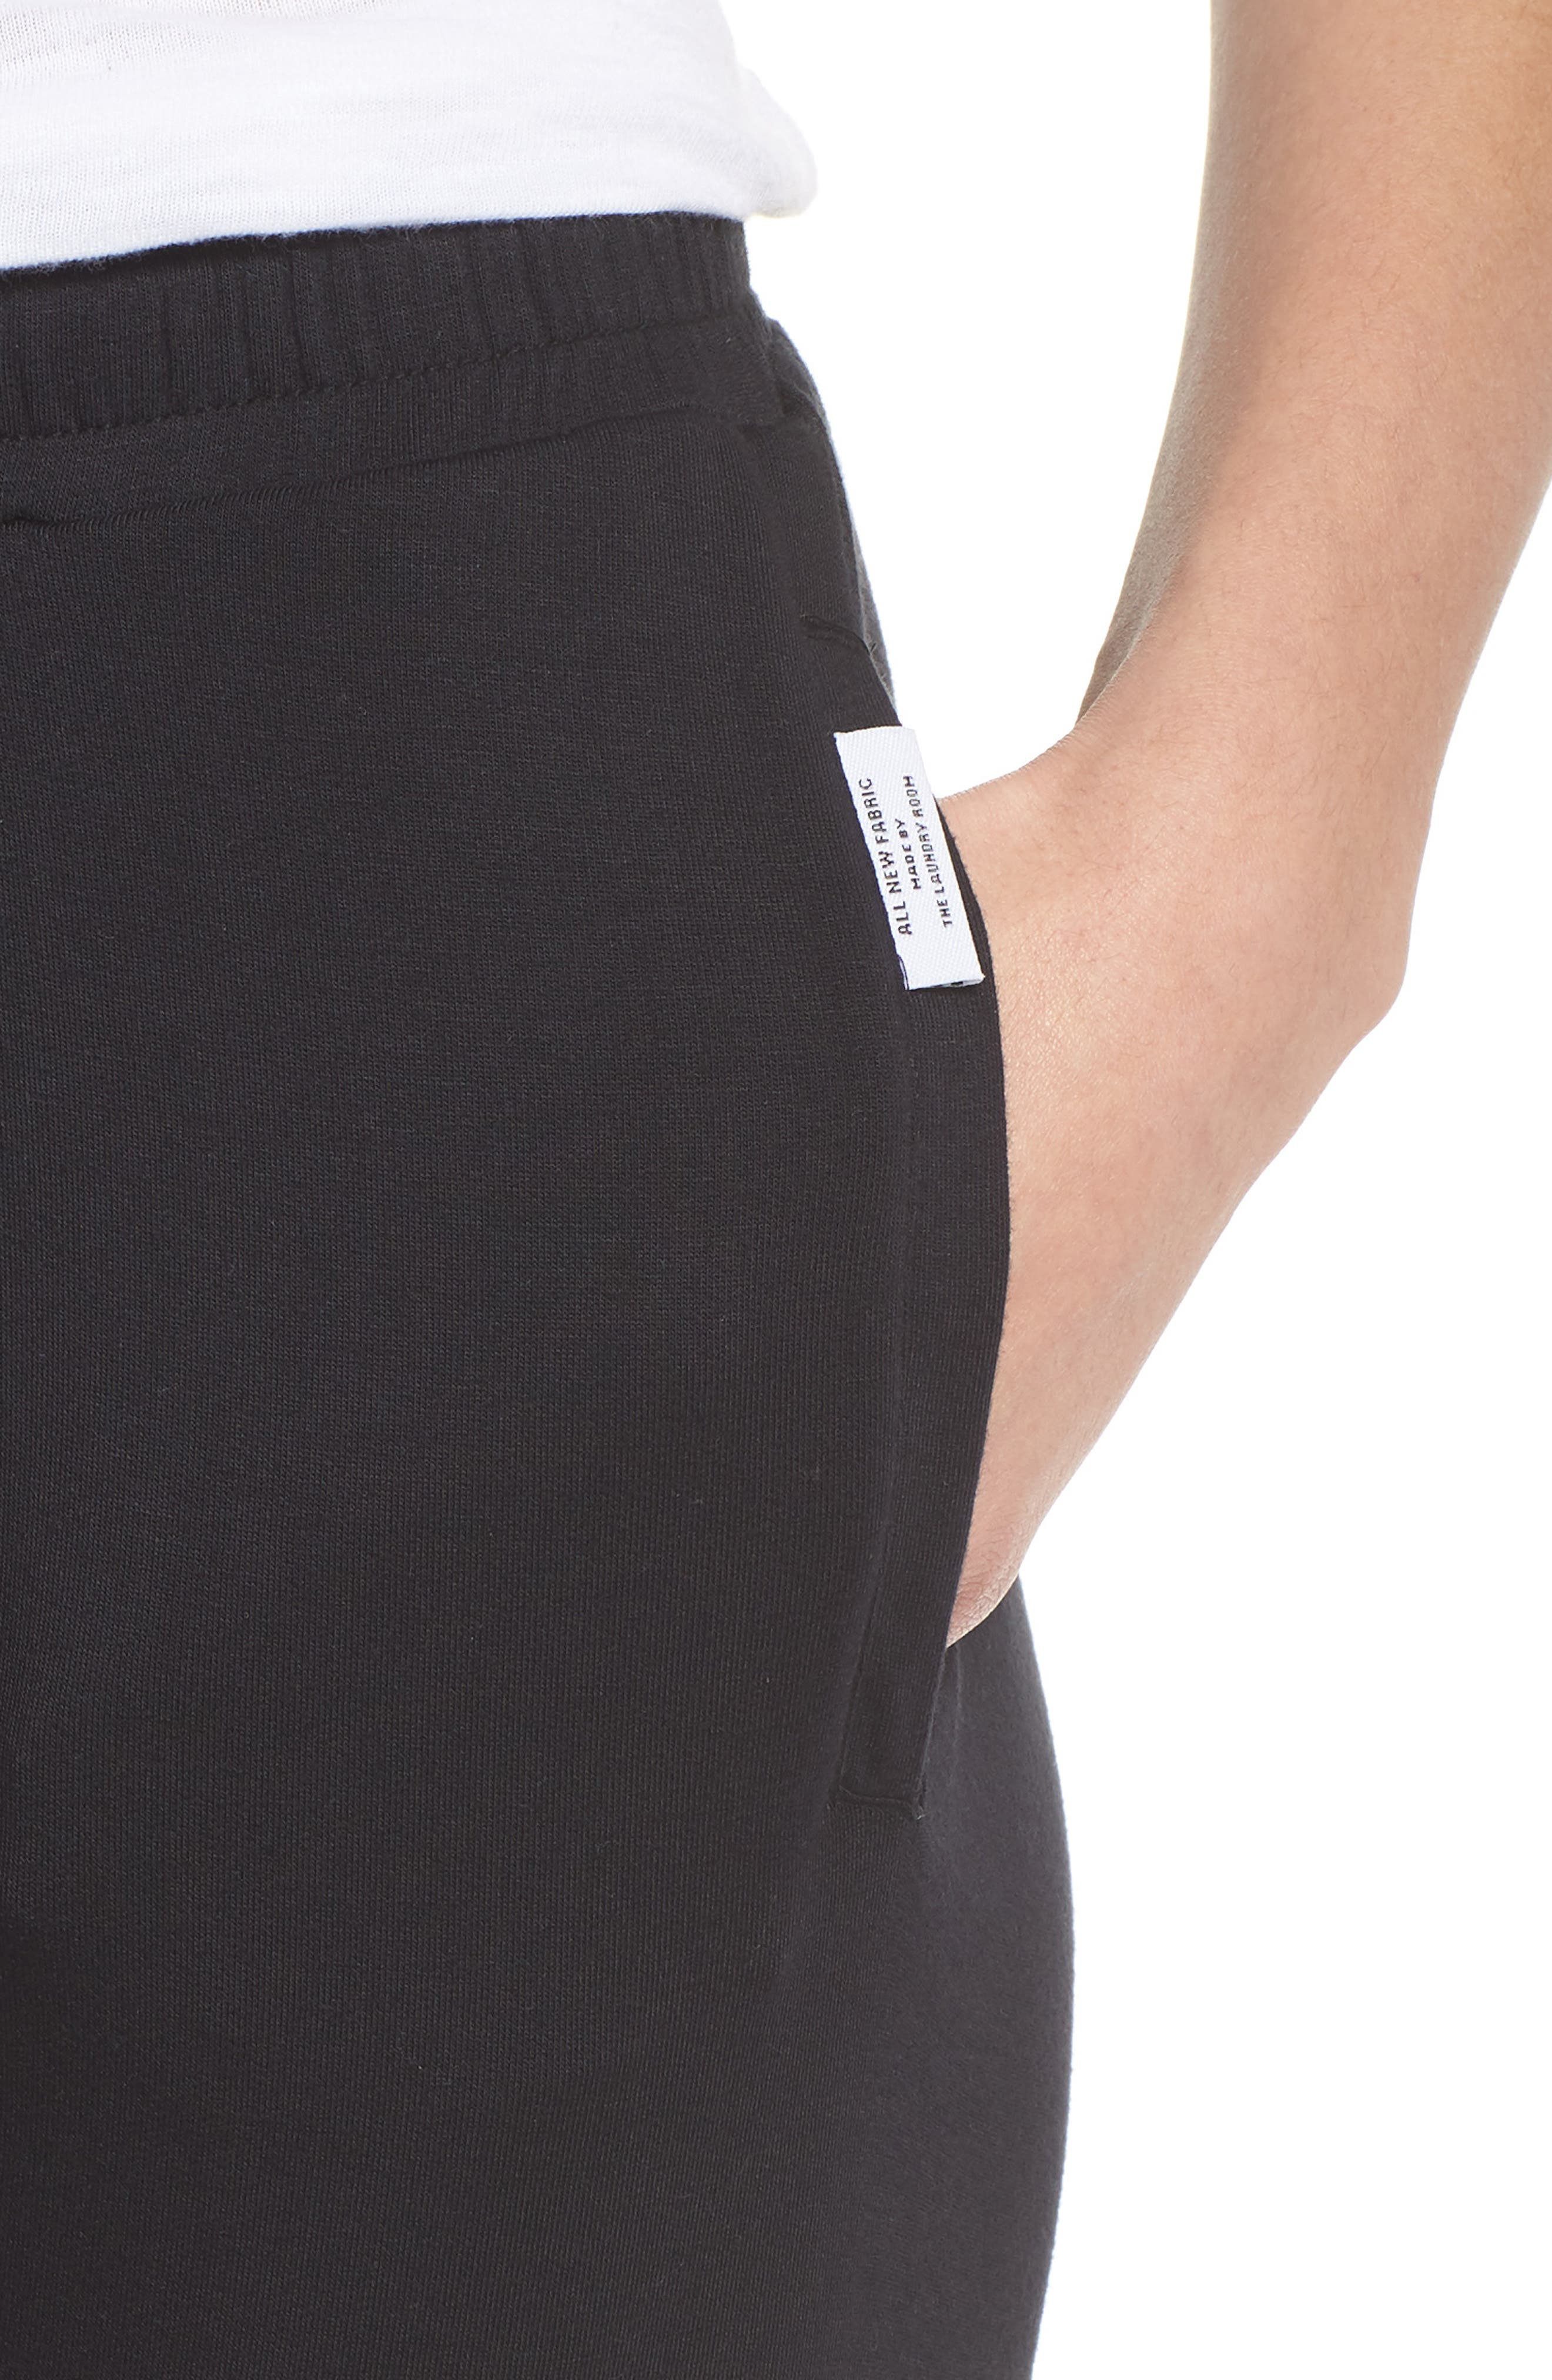 Lounge Pants,                             Alternate thumbnail 4, color,                             Black